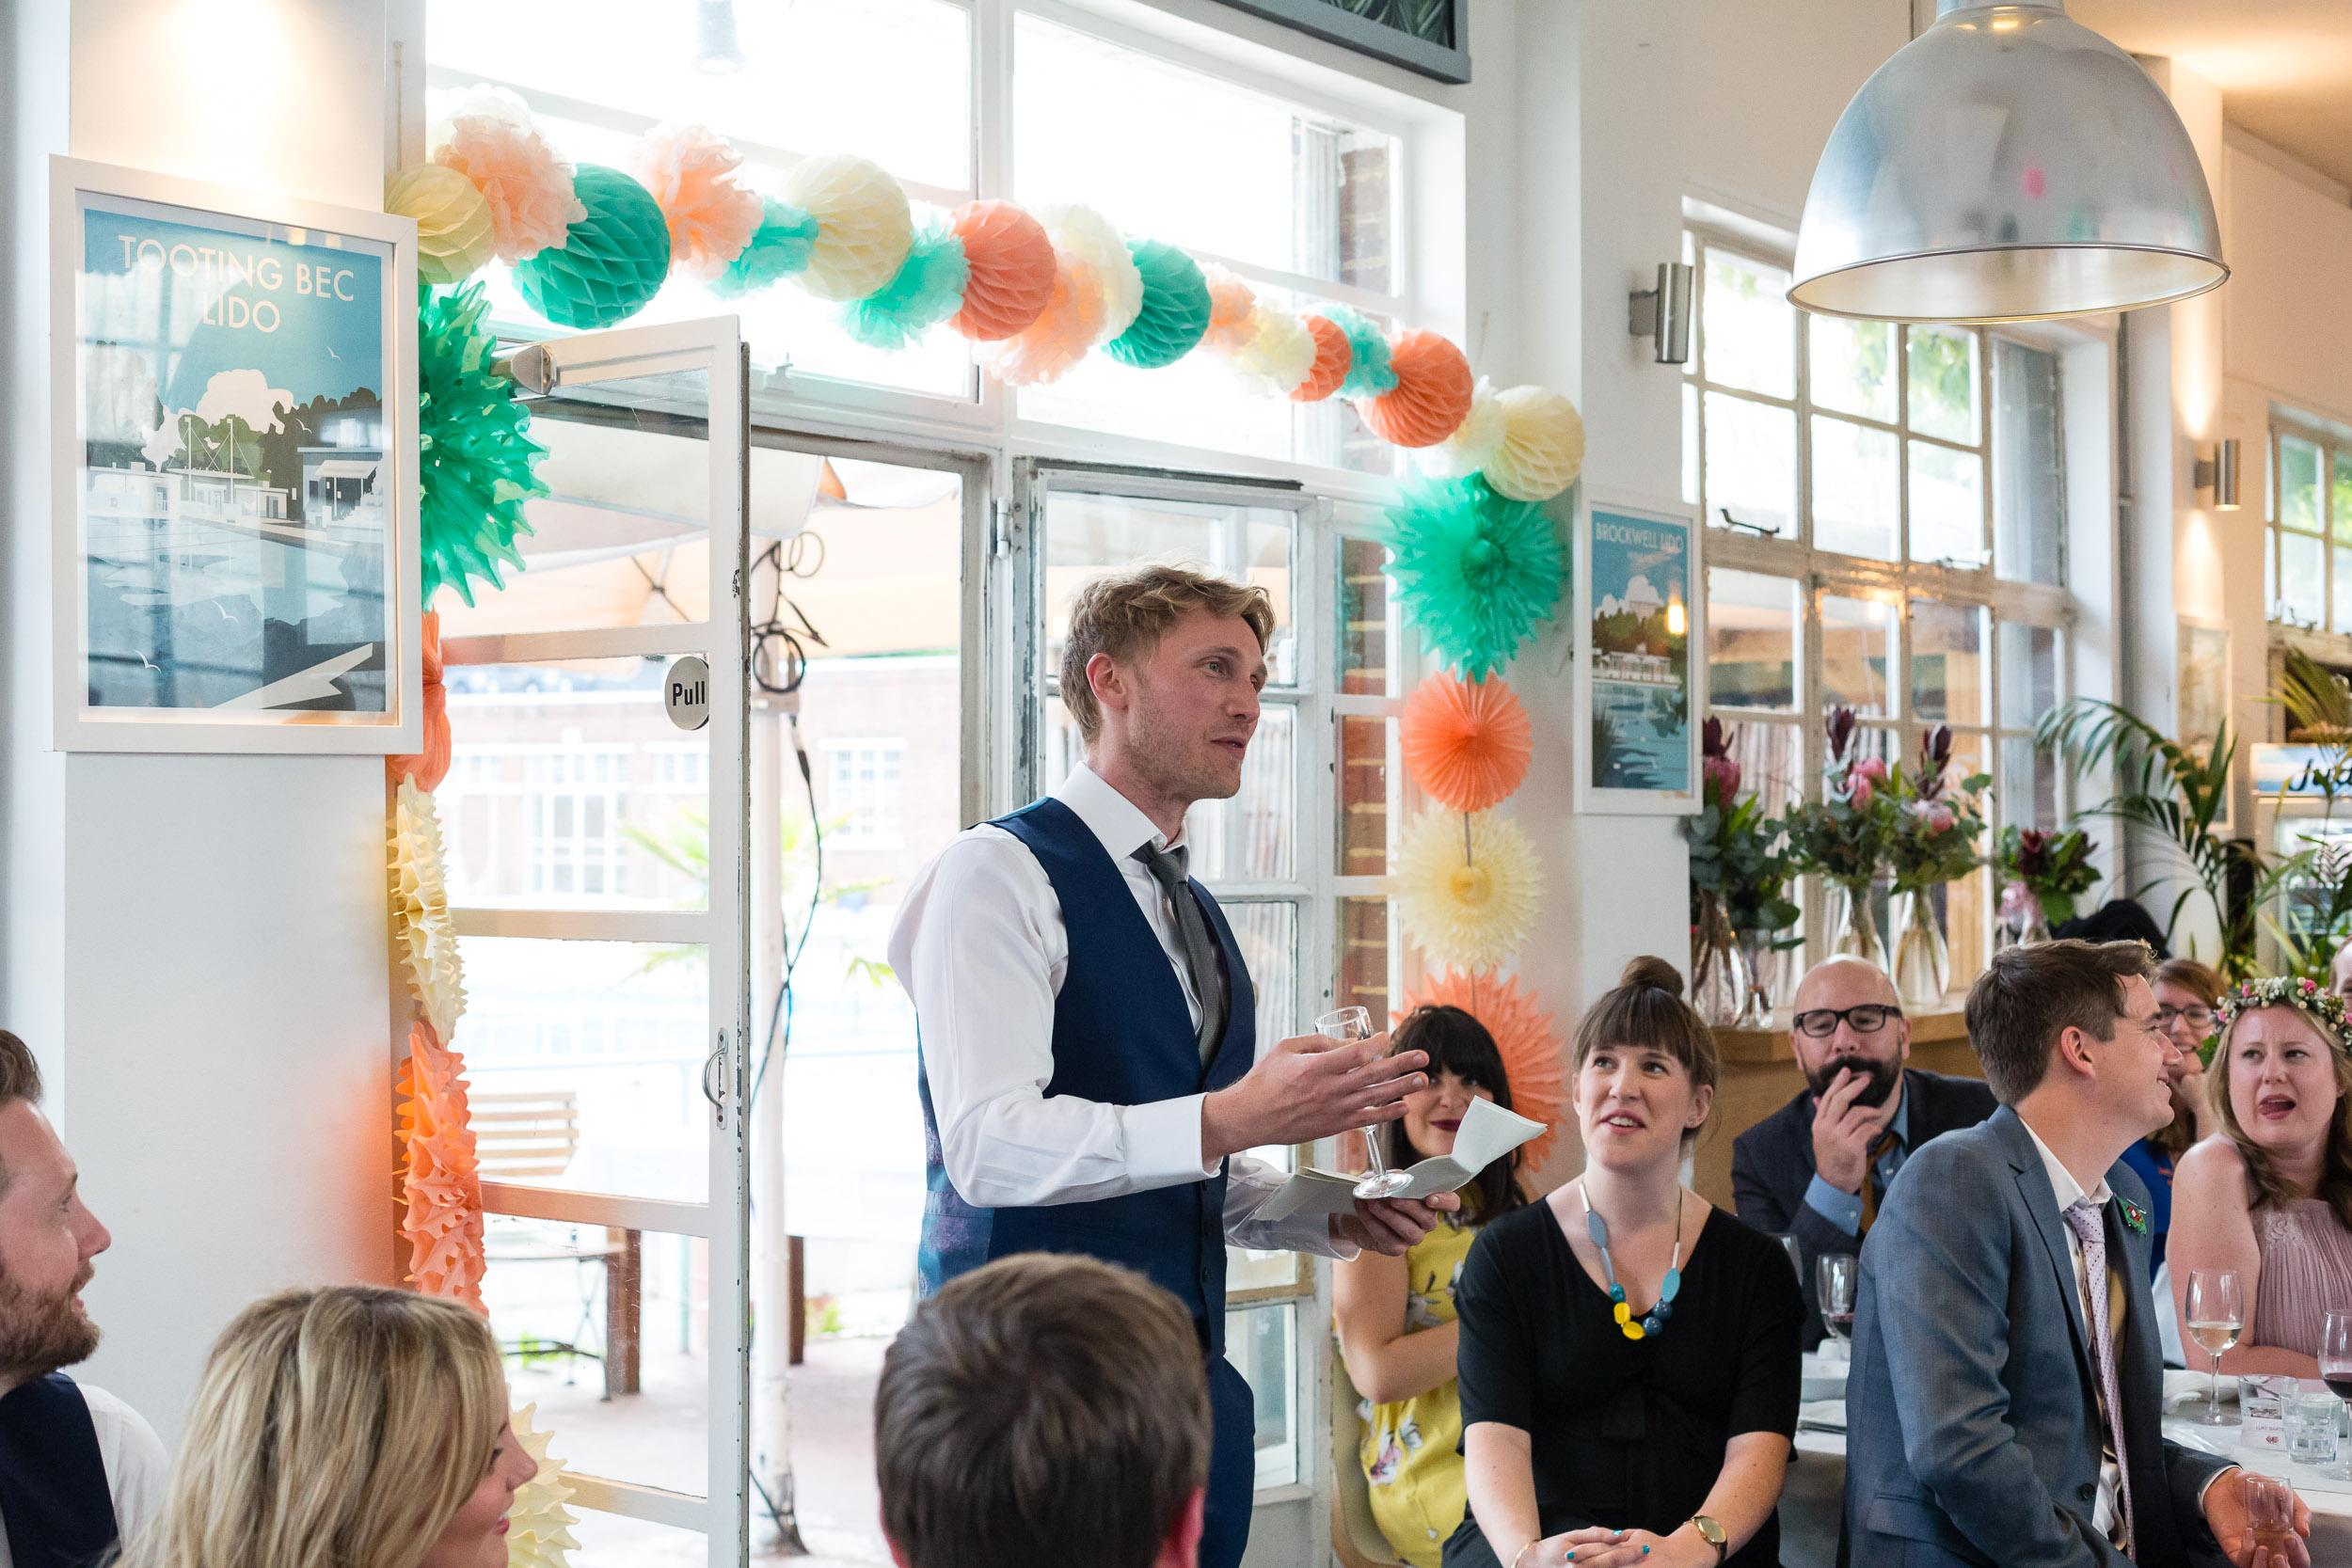 brockwell-lido-brixton-herne-hill-wedding-361.jpg